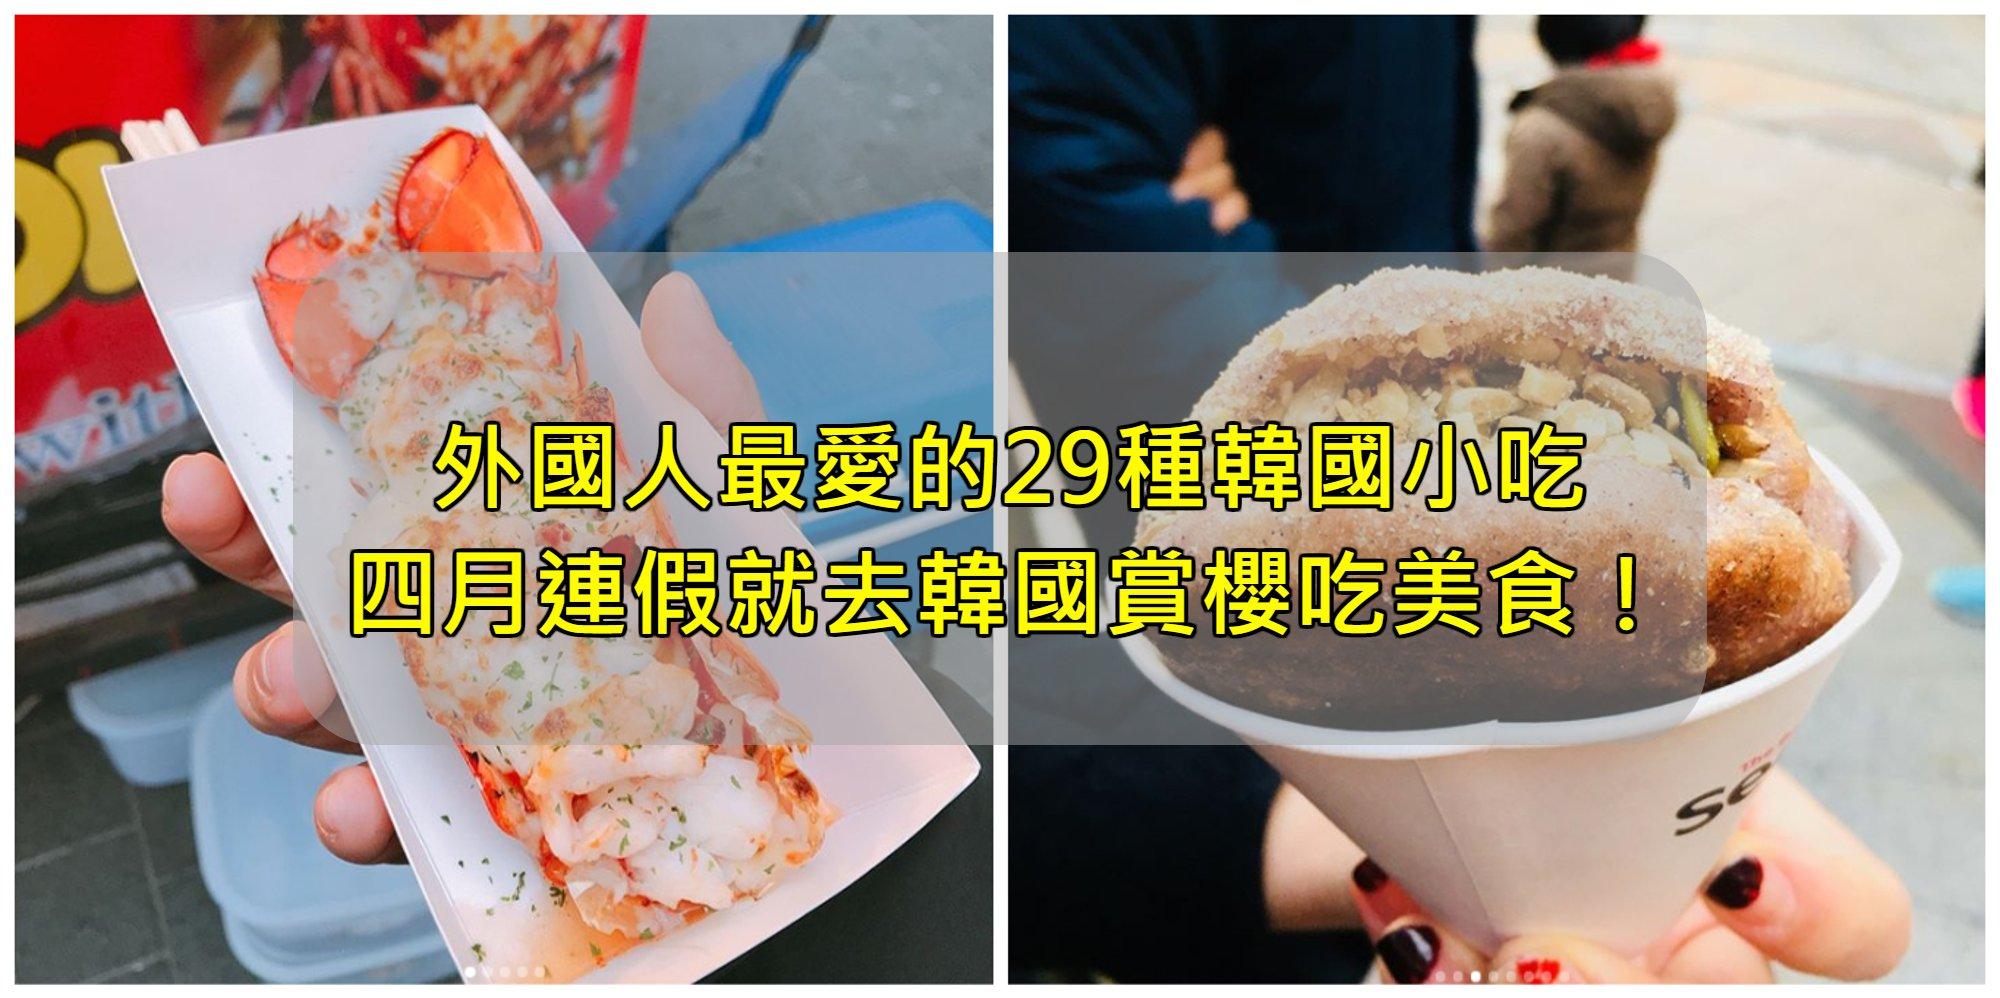 e59c96e789871 - 新亞洲美食王國?外國人認證29種神好吃的韓國街頭美食大盤點!